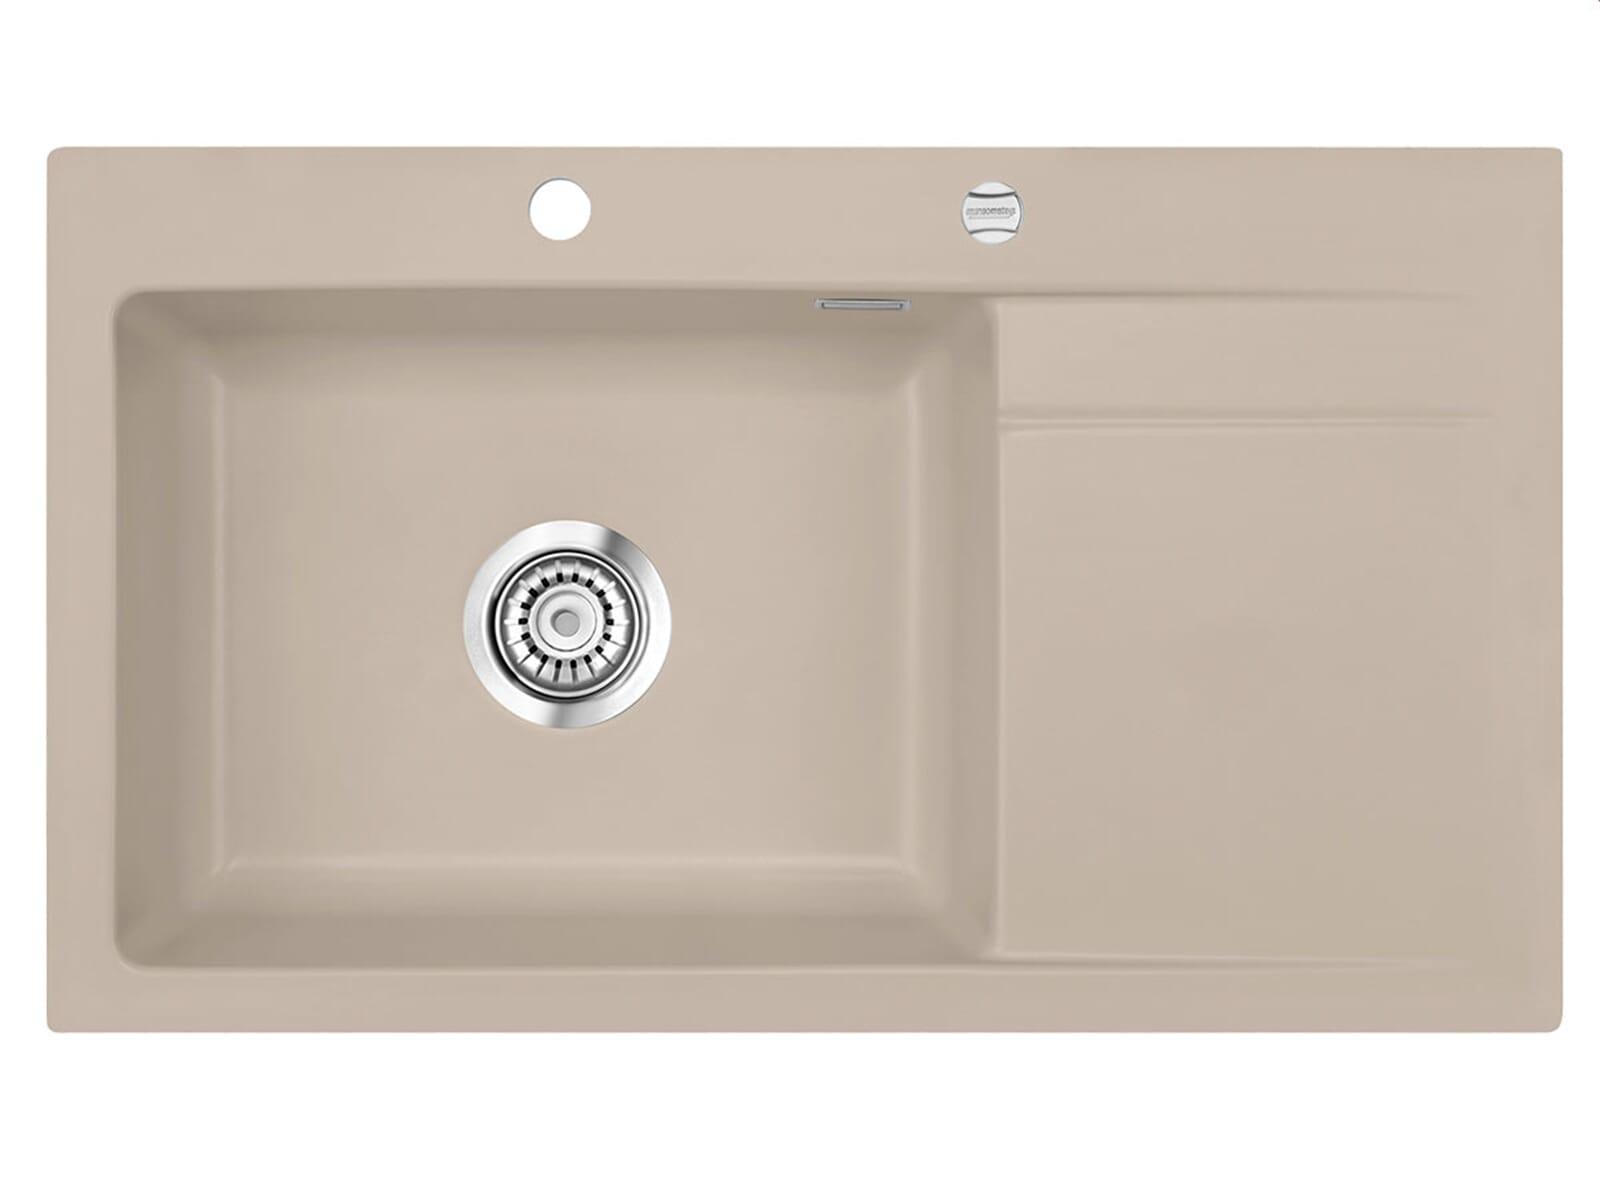 Systemceram Stema 86 SL Fango Keramikspüle Excenterbetätigung